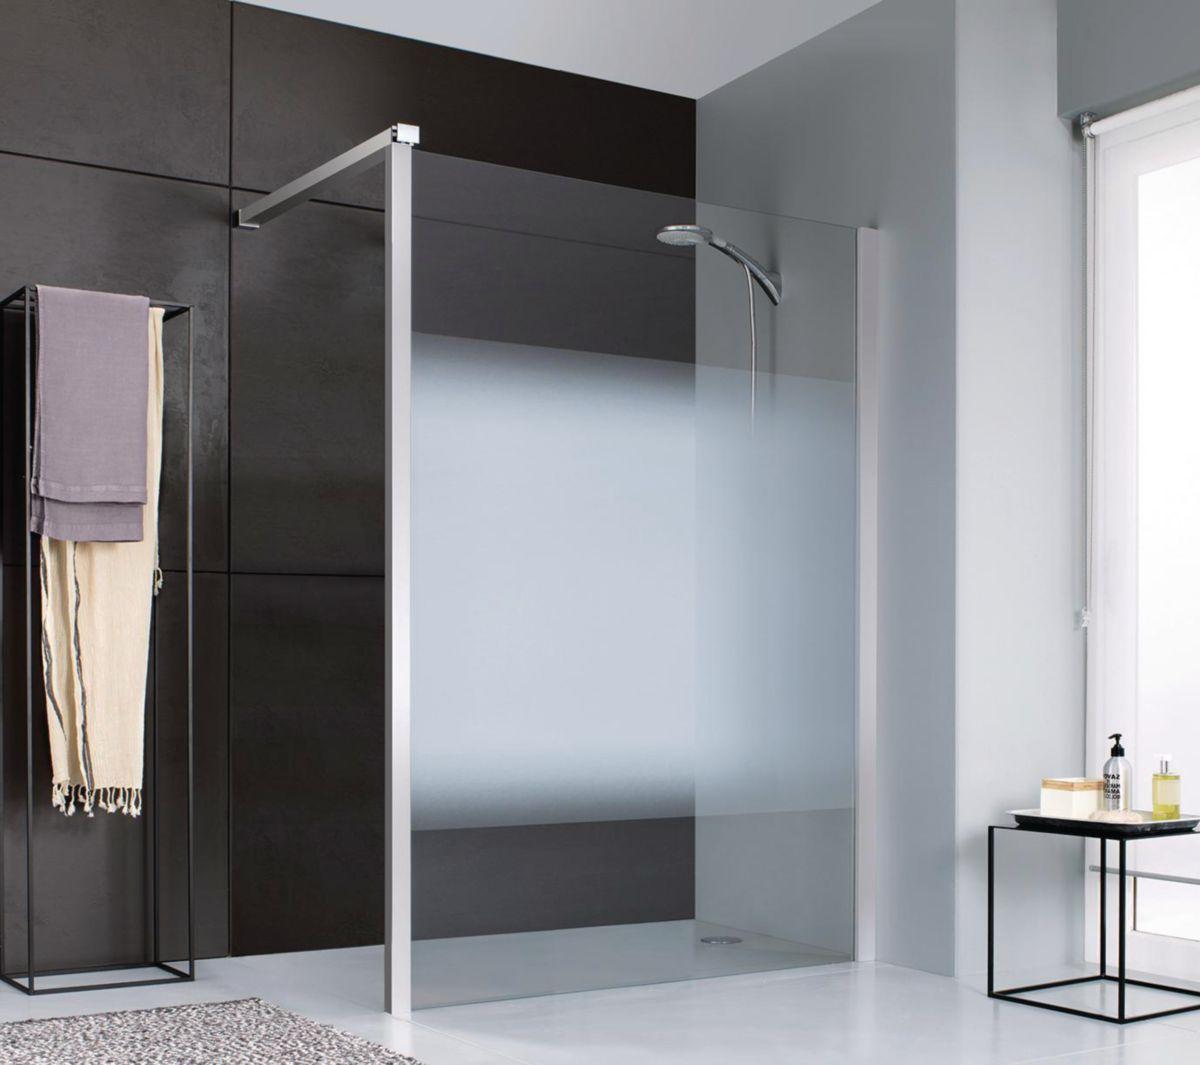 good paroi jazz retour douche ouverte verre dgrad dpoli rf ljado leda sanitaire cedeo with. Black Bedroom Furniture Sets. Home Design Ideas